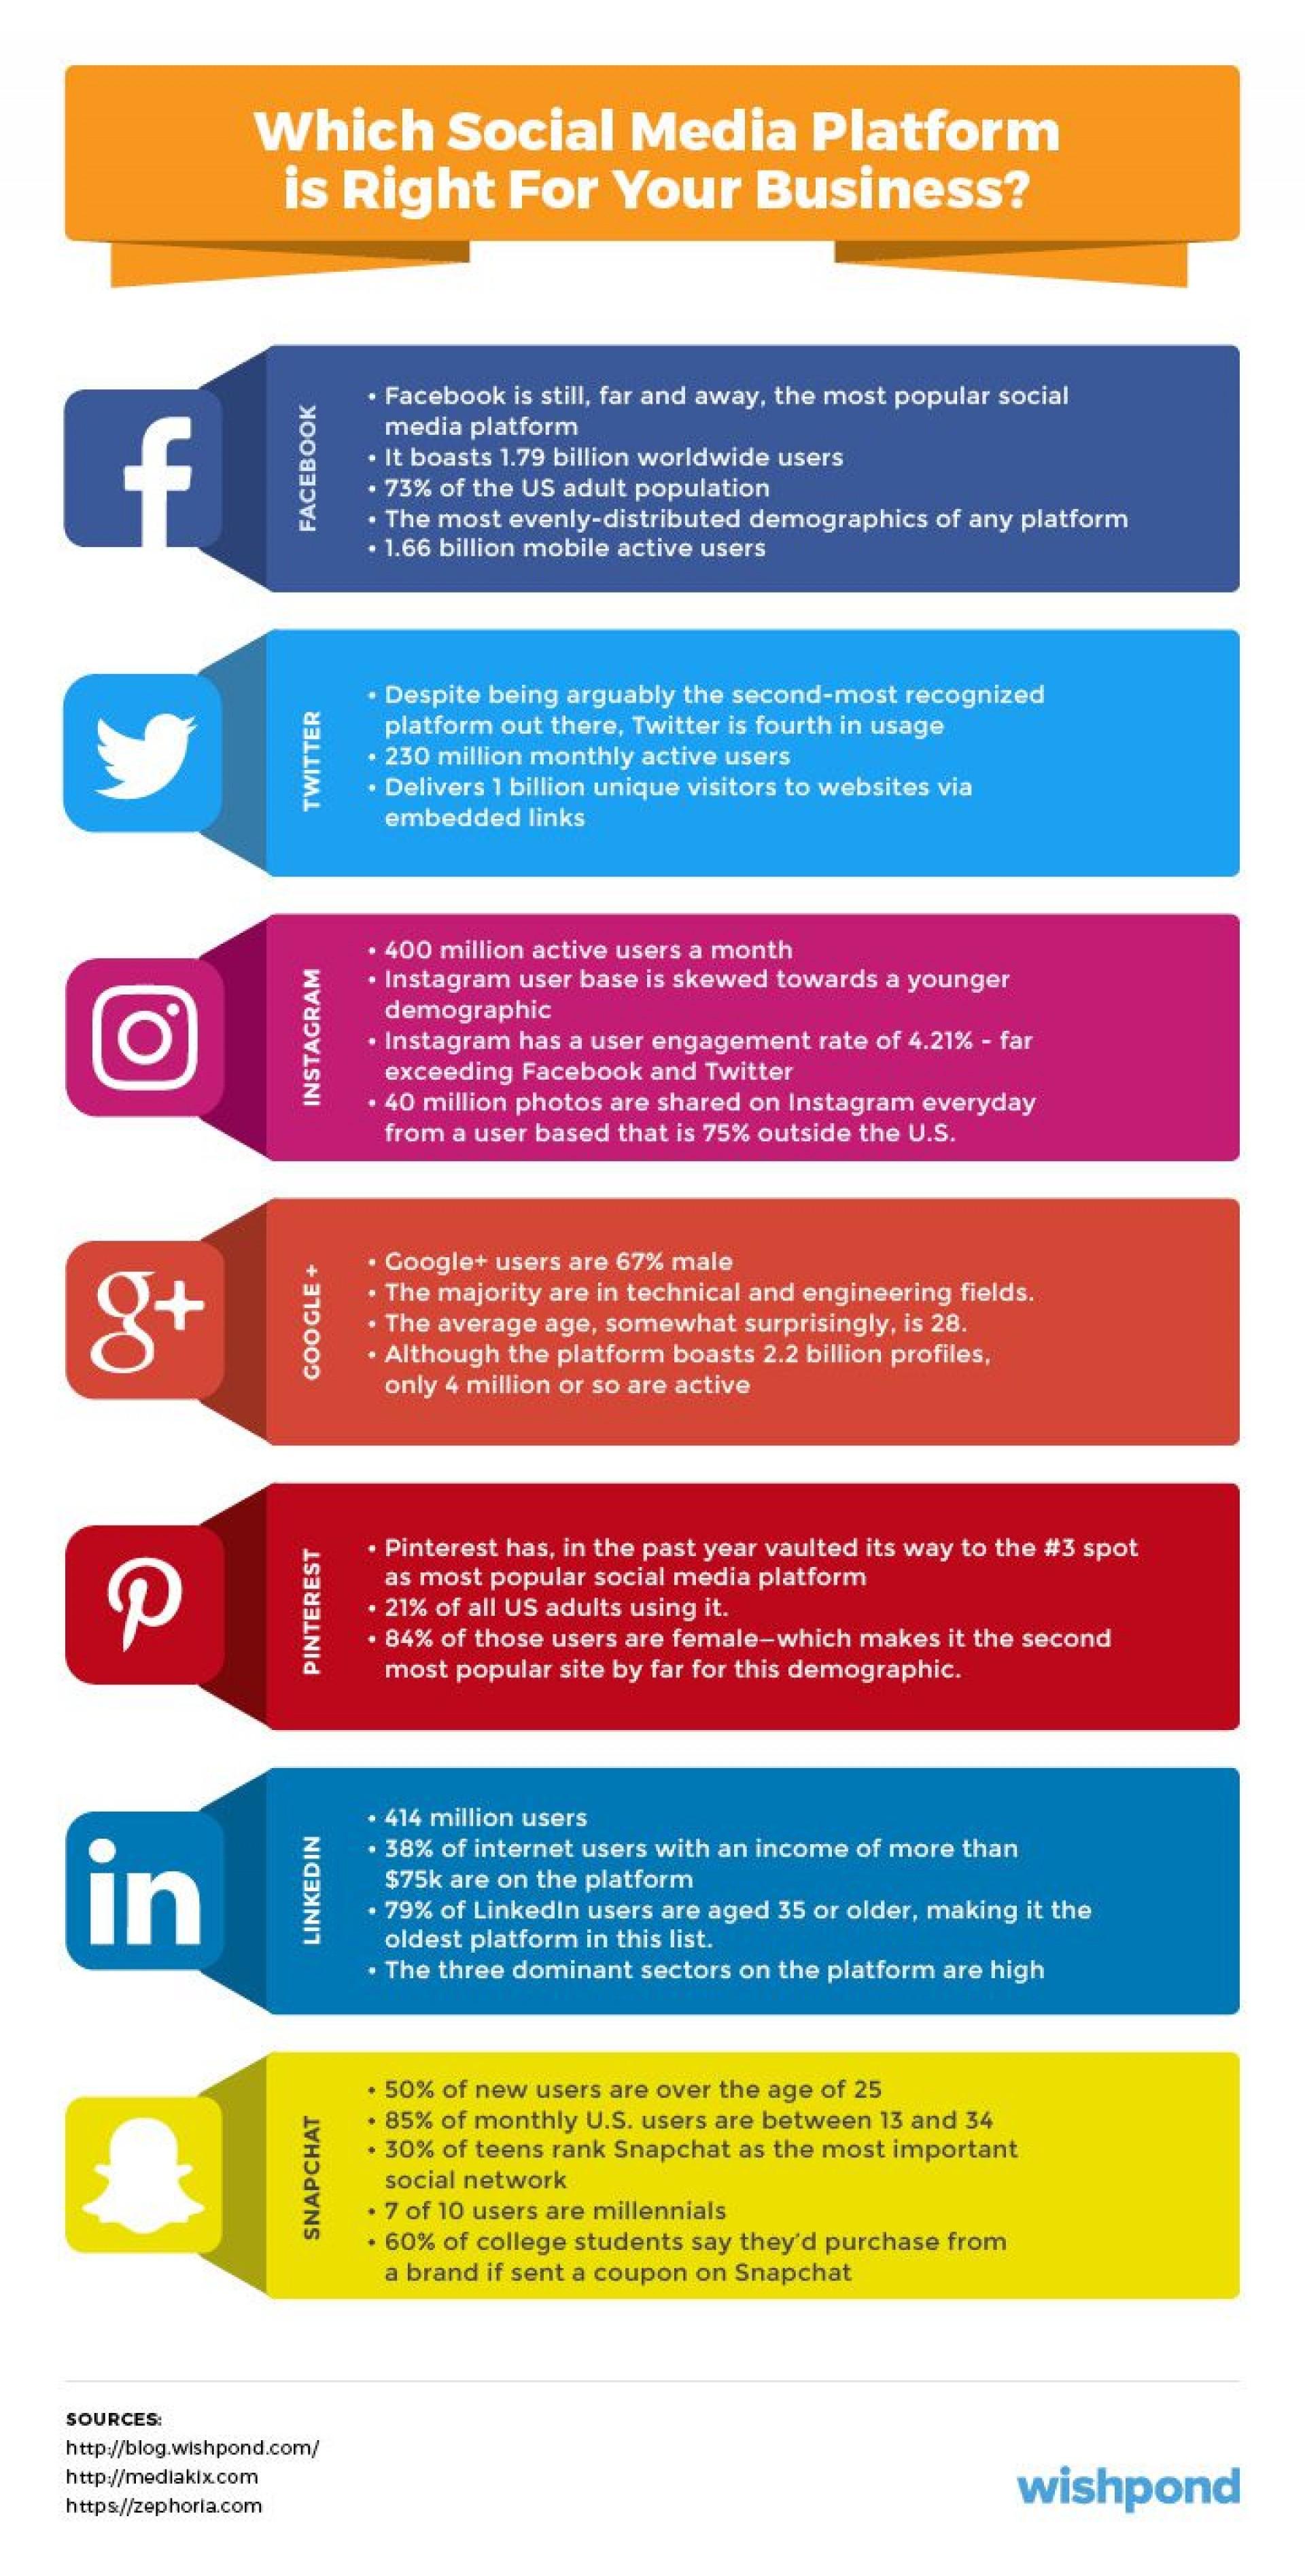 009 Frightening Social Media Marketing Proposal Template Word Concept  Plan1920